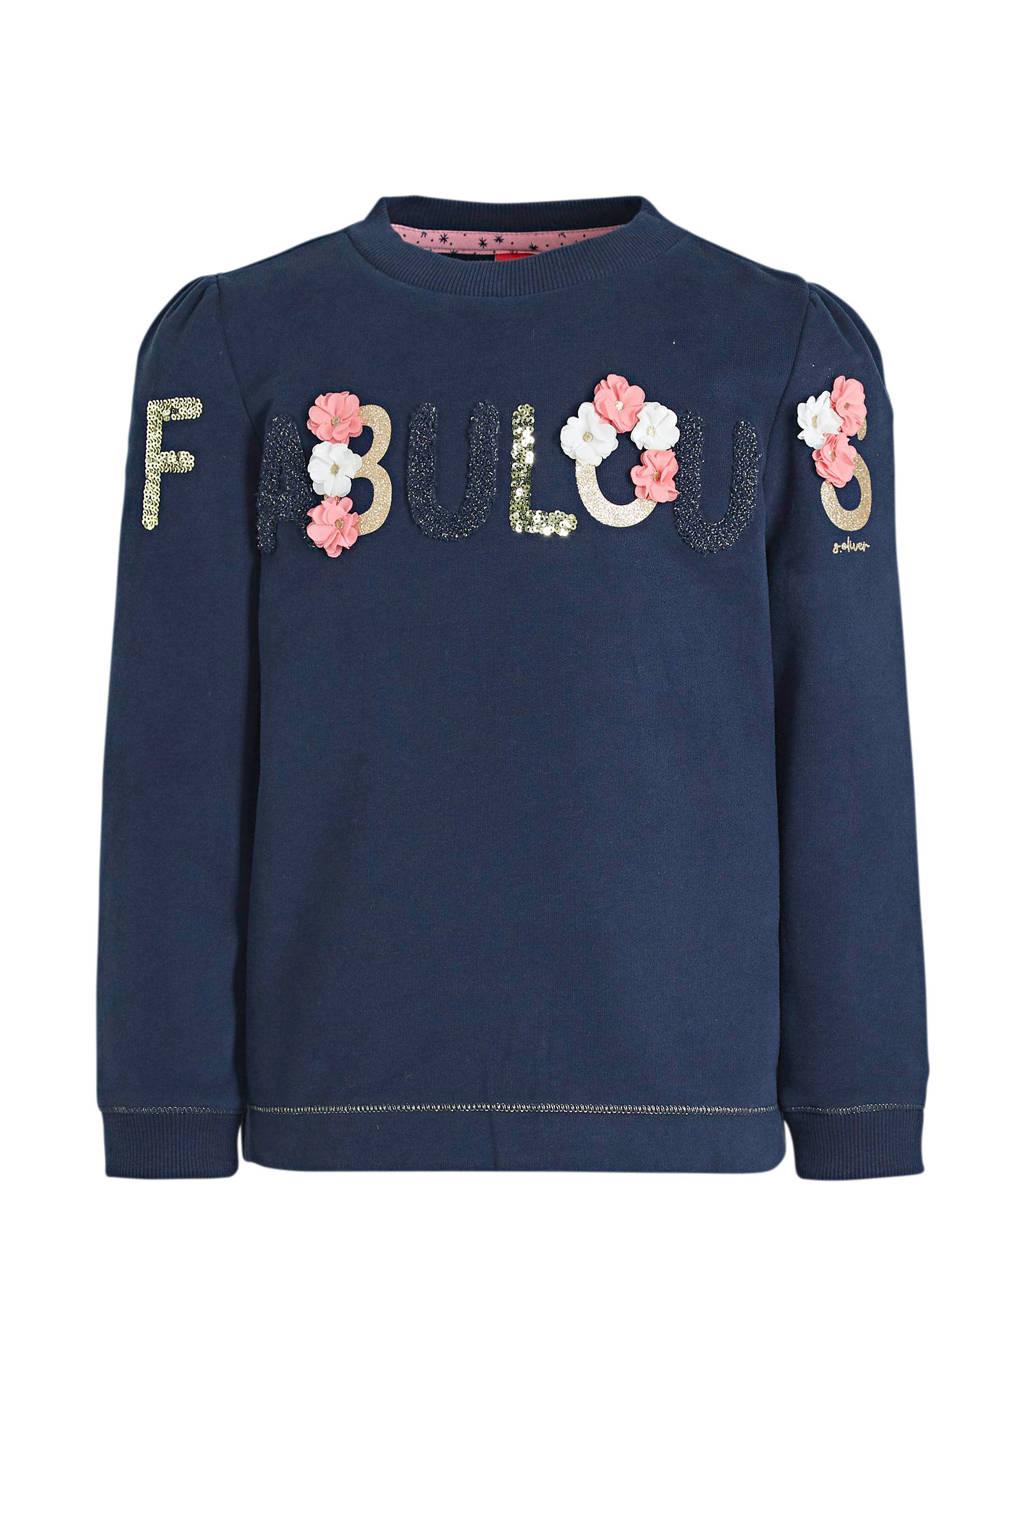 s.Oliver sweater met tekst en pailletten donkerblauw/roze/goud, Donkerblauw/roze/goud